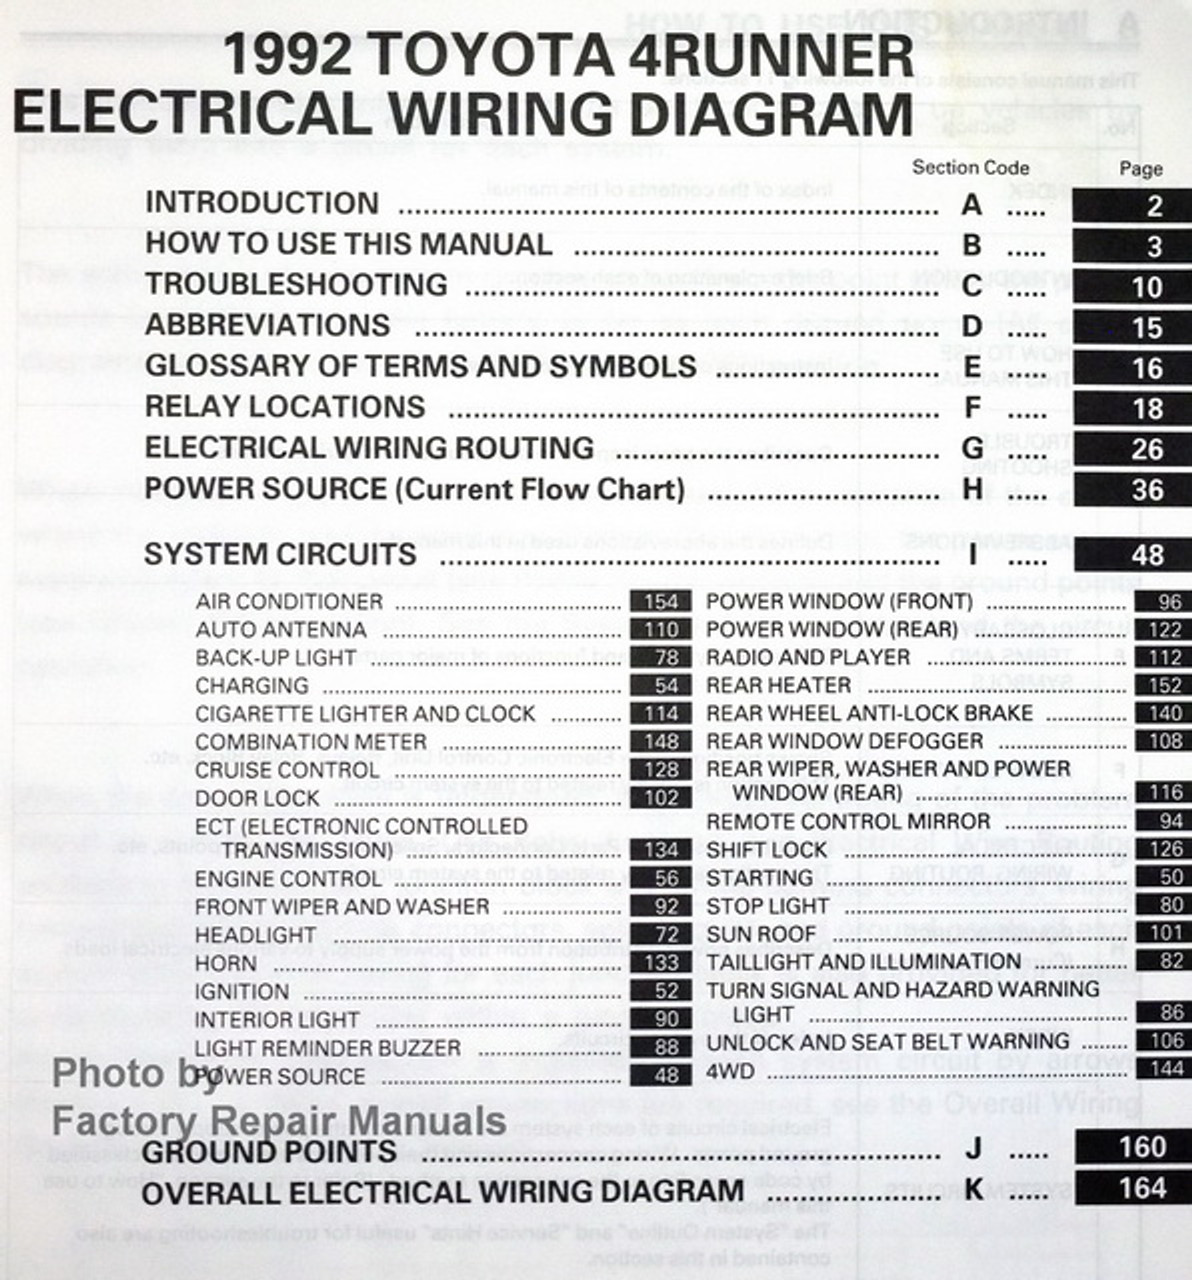 1992 Toyota 4runner Electrical Wiring Diagrams Original